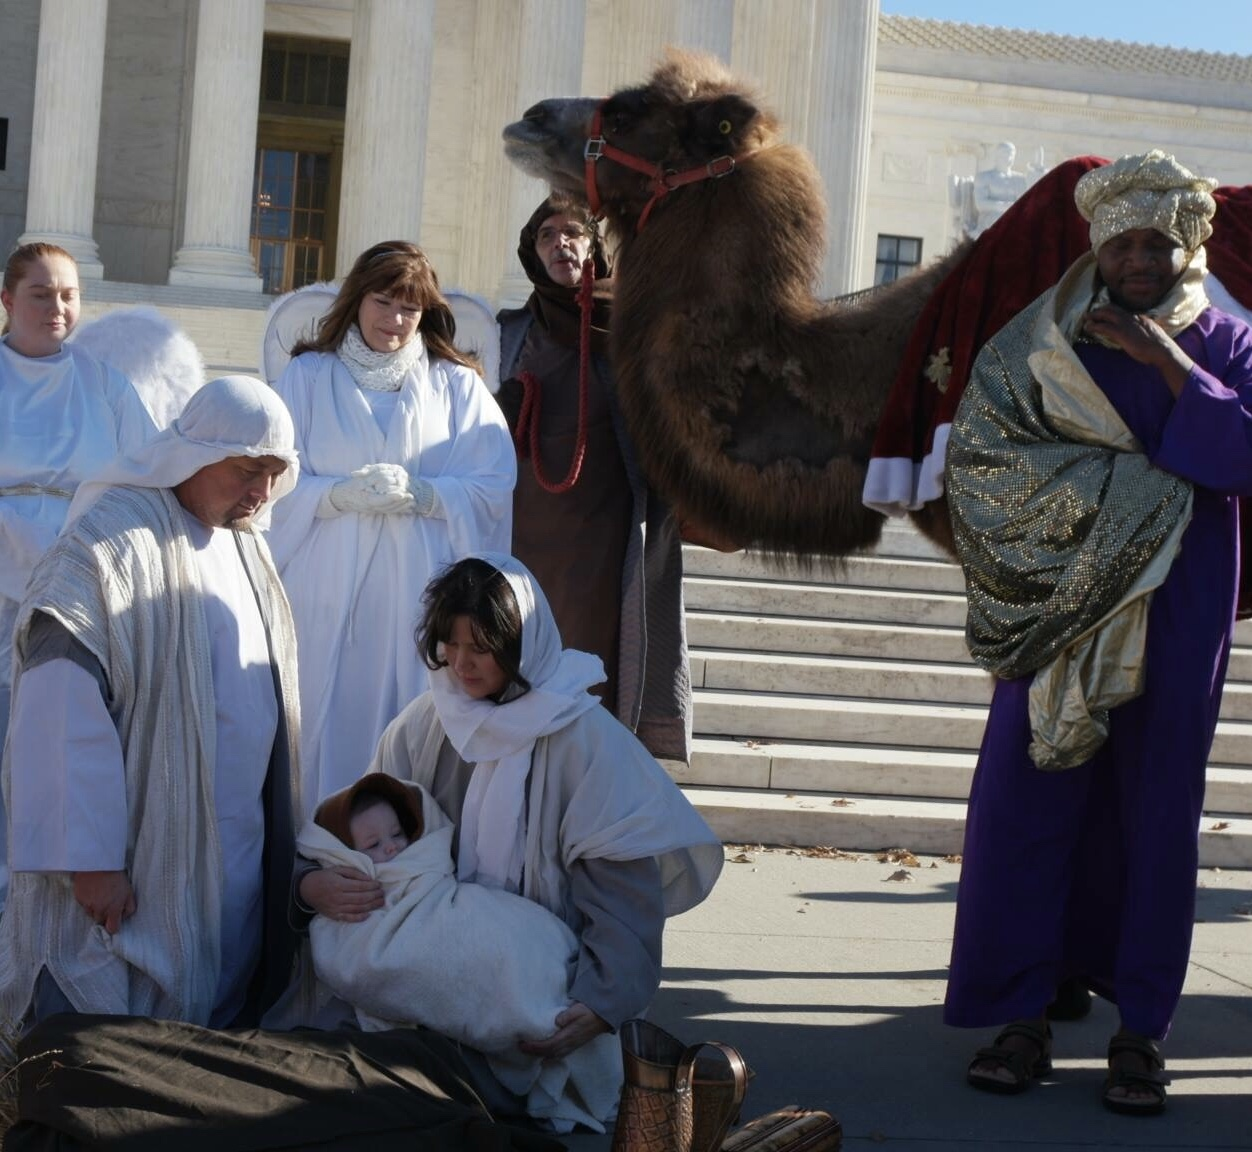 Live Nativity U.S. Capitol Washington, DC